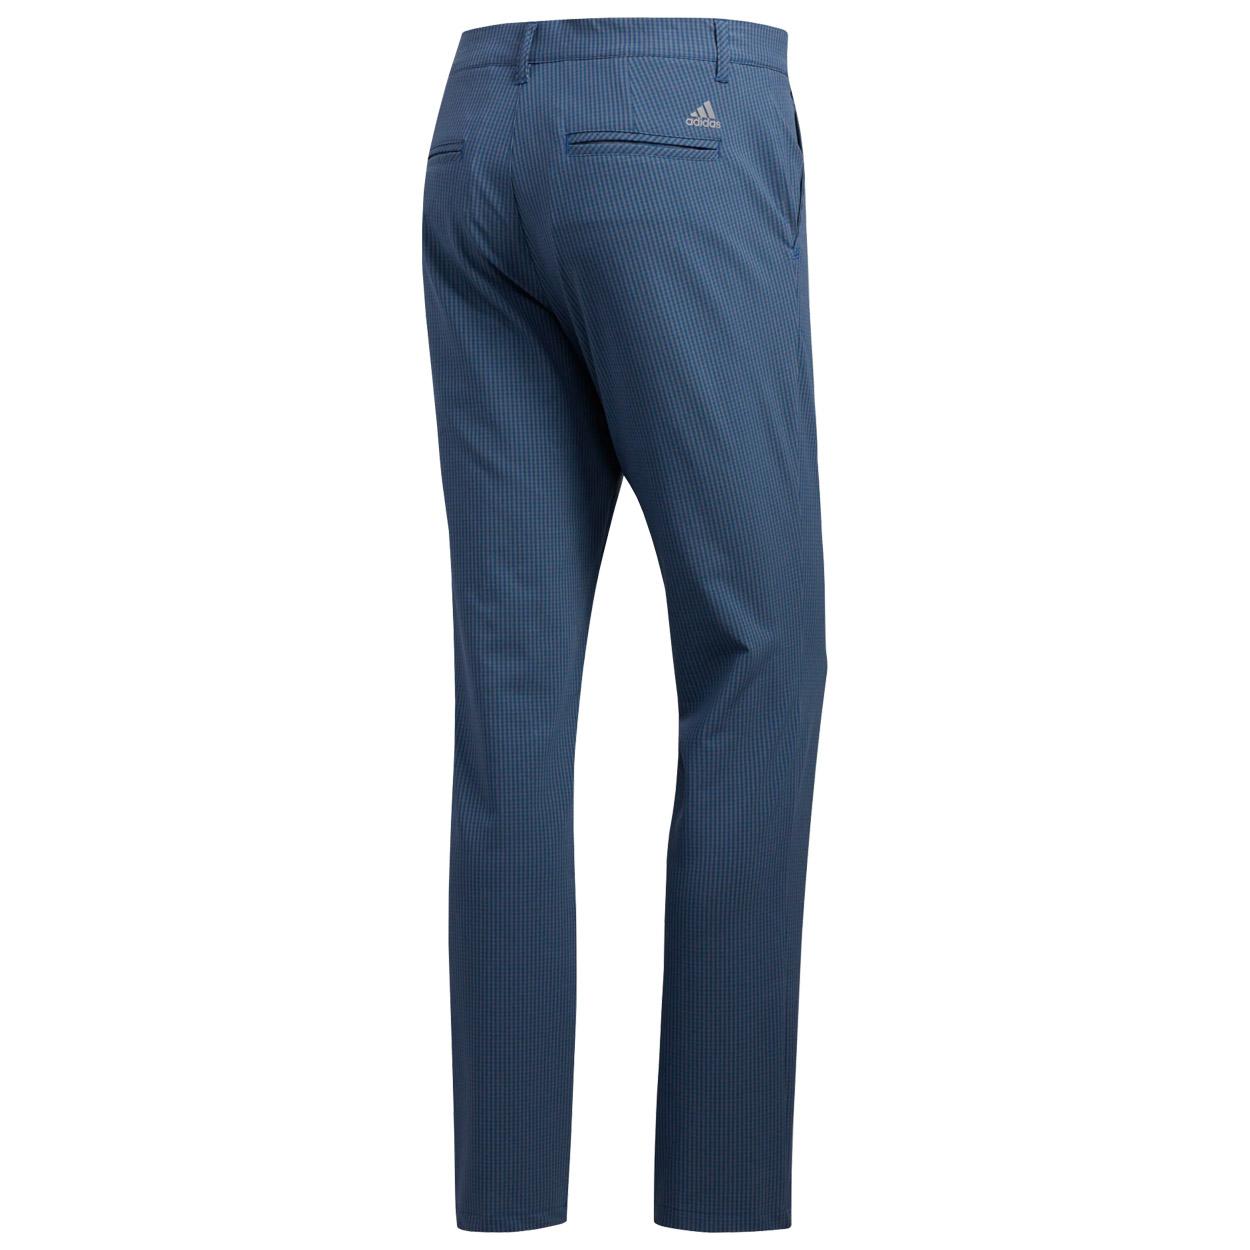 Adidas-Ultimate-365-Gingham-Men-039-s-Golf-Pants-New thumbnail 5